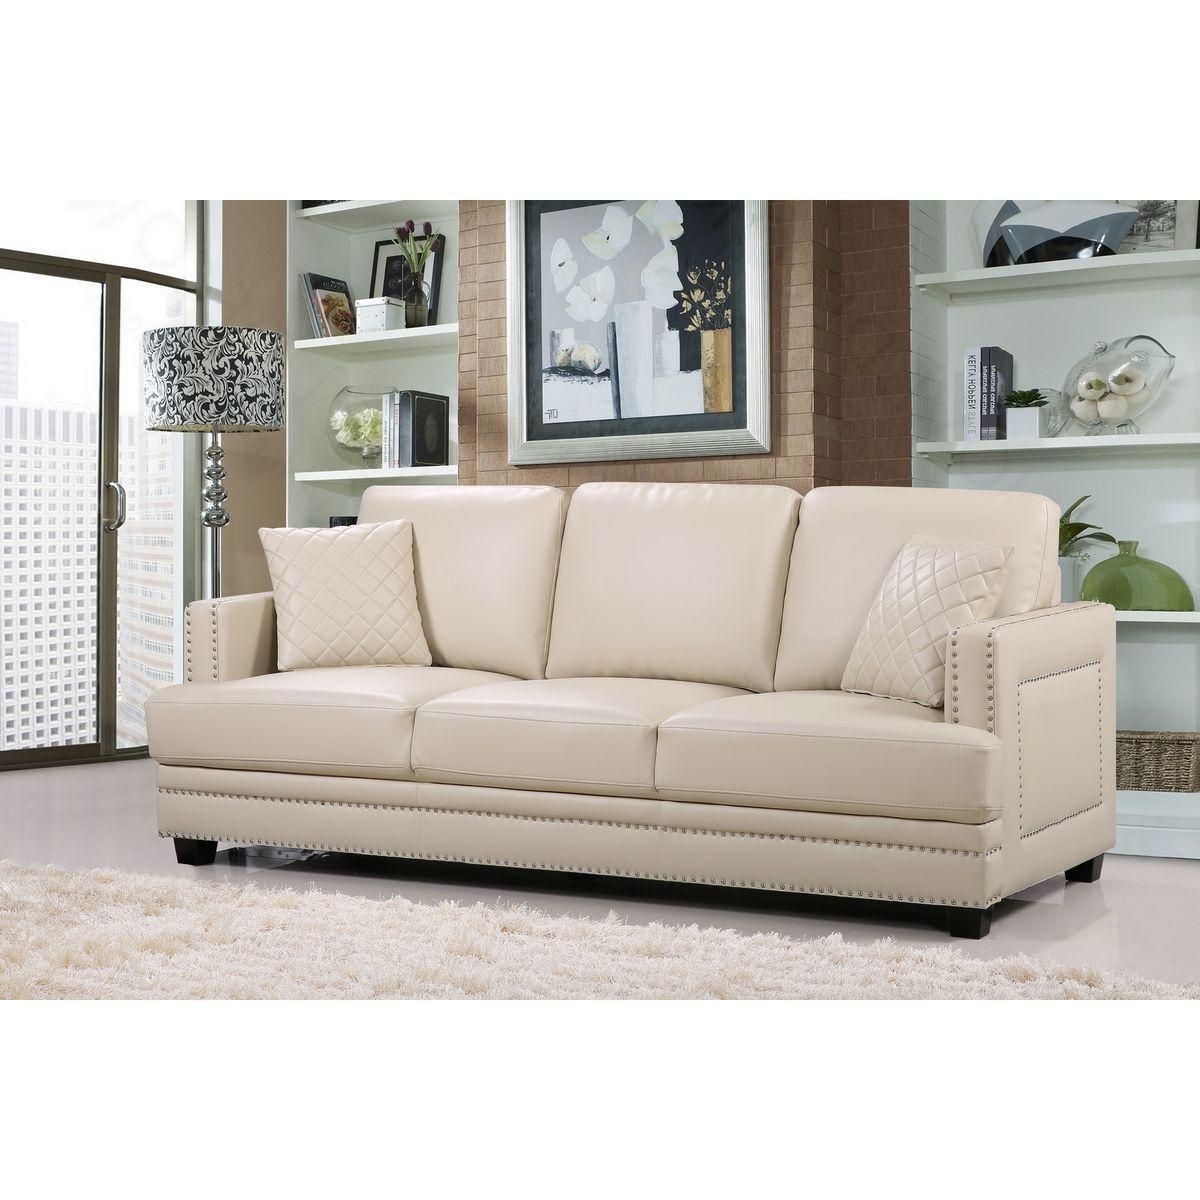 Meridian 655be S Ferrara Beige Leather Sofa W Silver Nailhead